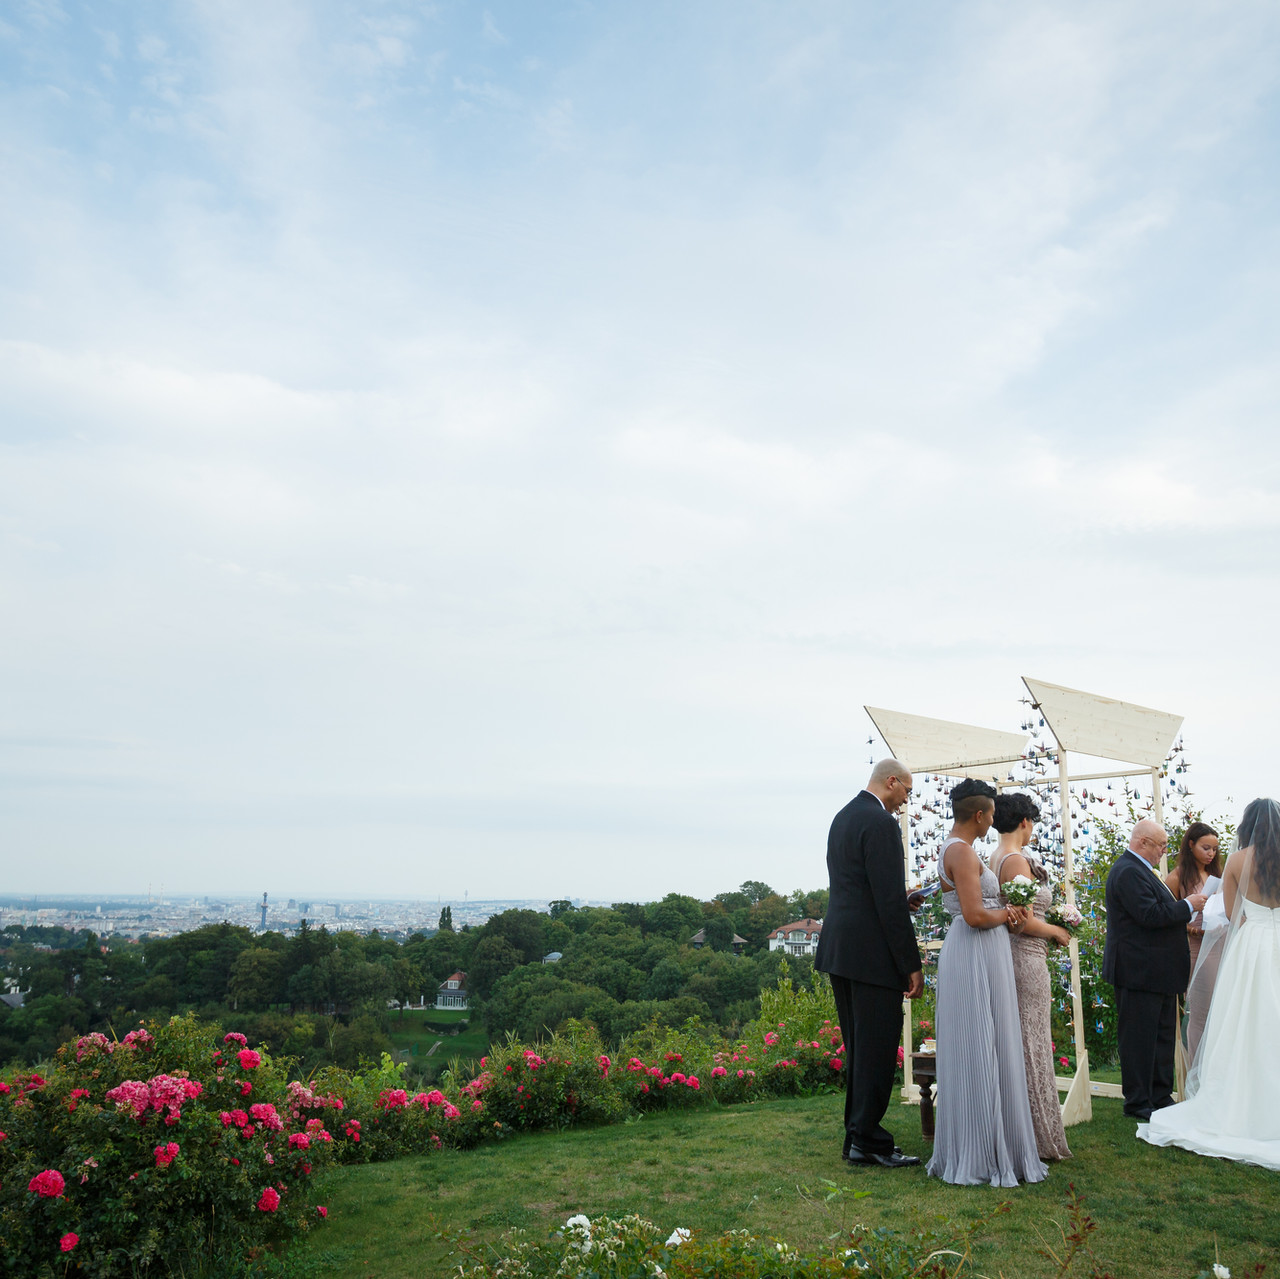 Mia Jesse Wedding September 2015 Camera One (1813 of 2155)